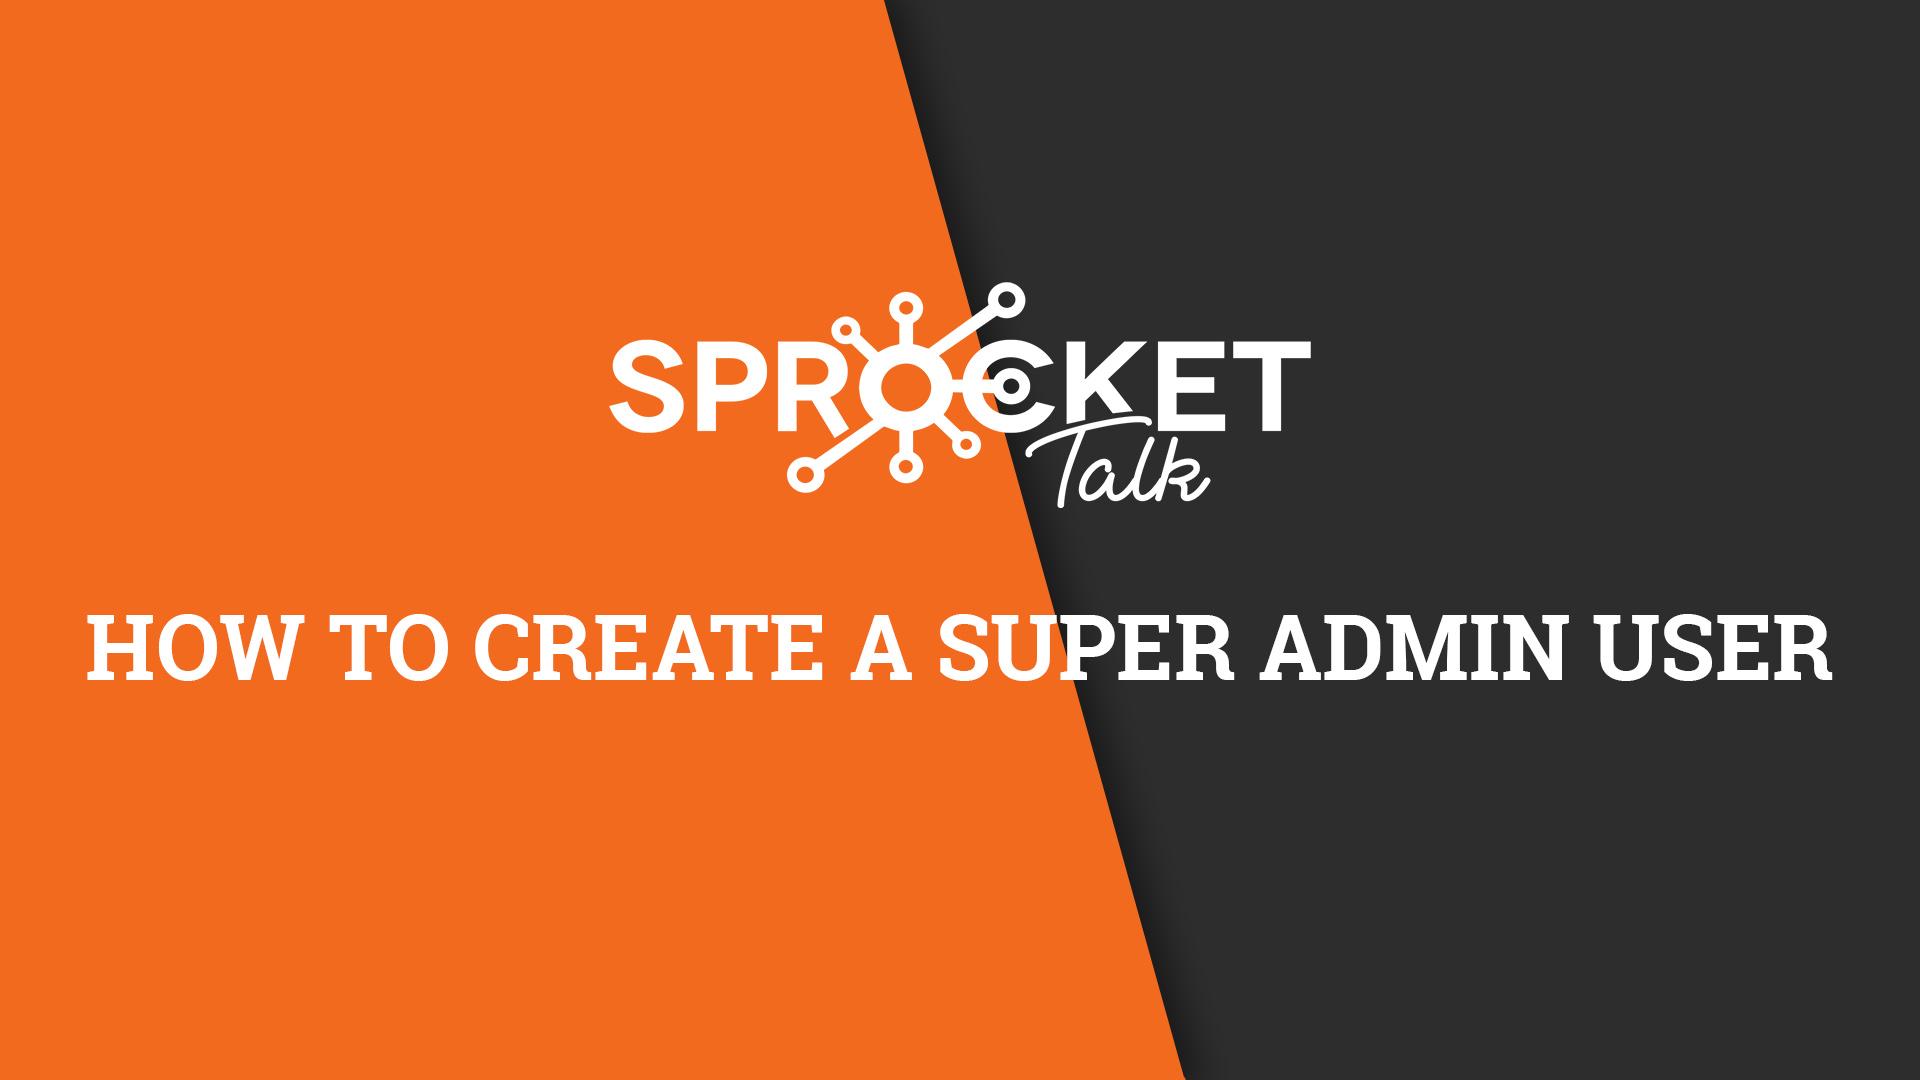 How to Create a Super Admin User